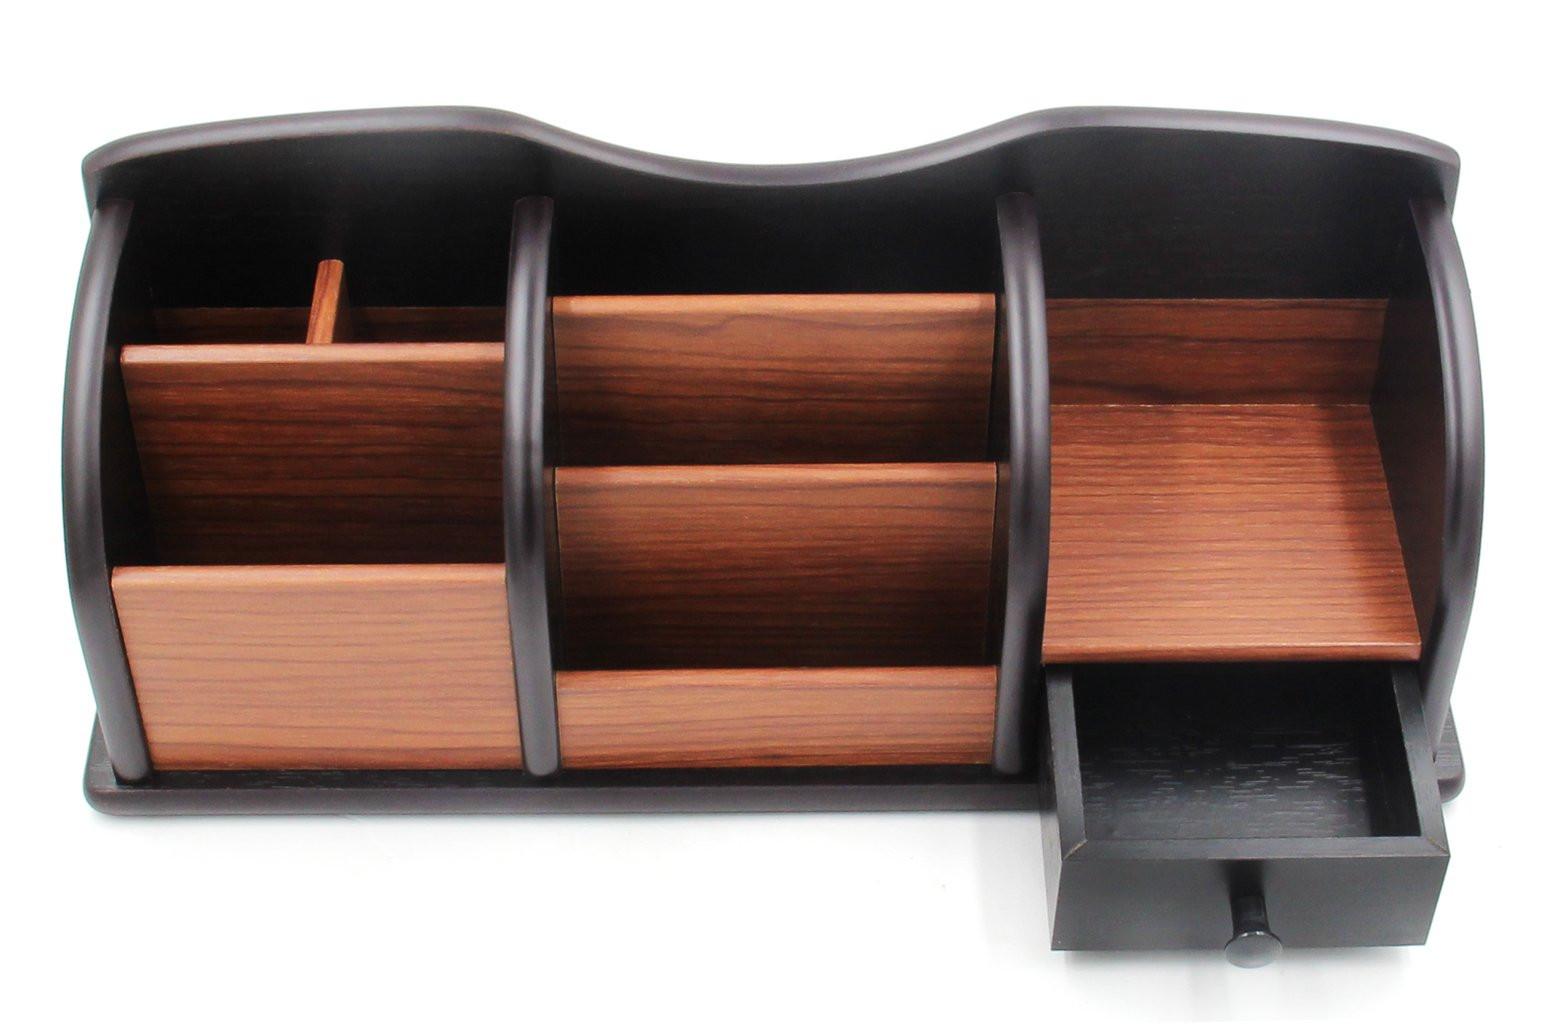 Desk Caddy Organizer  PAG fice Supplies Wood Desk Organizer Pen Holder